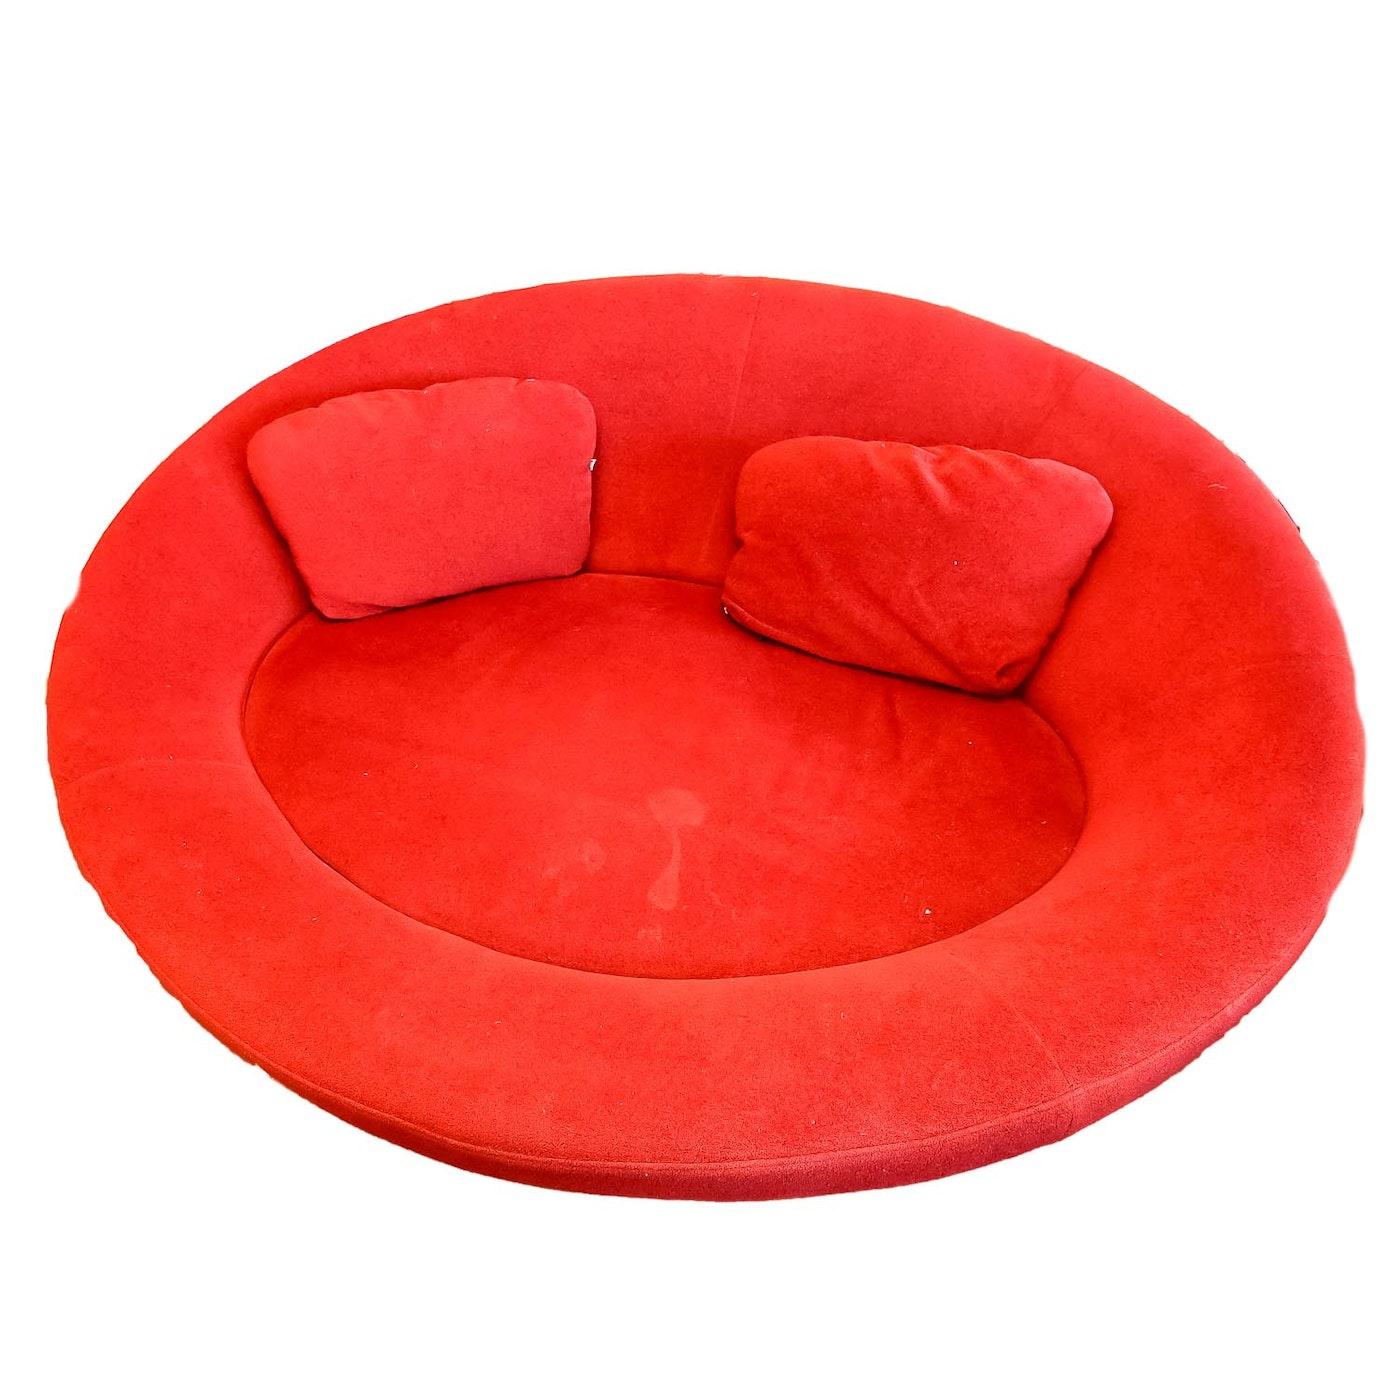 red contemporary oval sofa ebth. Black Bedroom Furniture Sets. Home Design Ideas